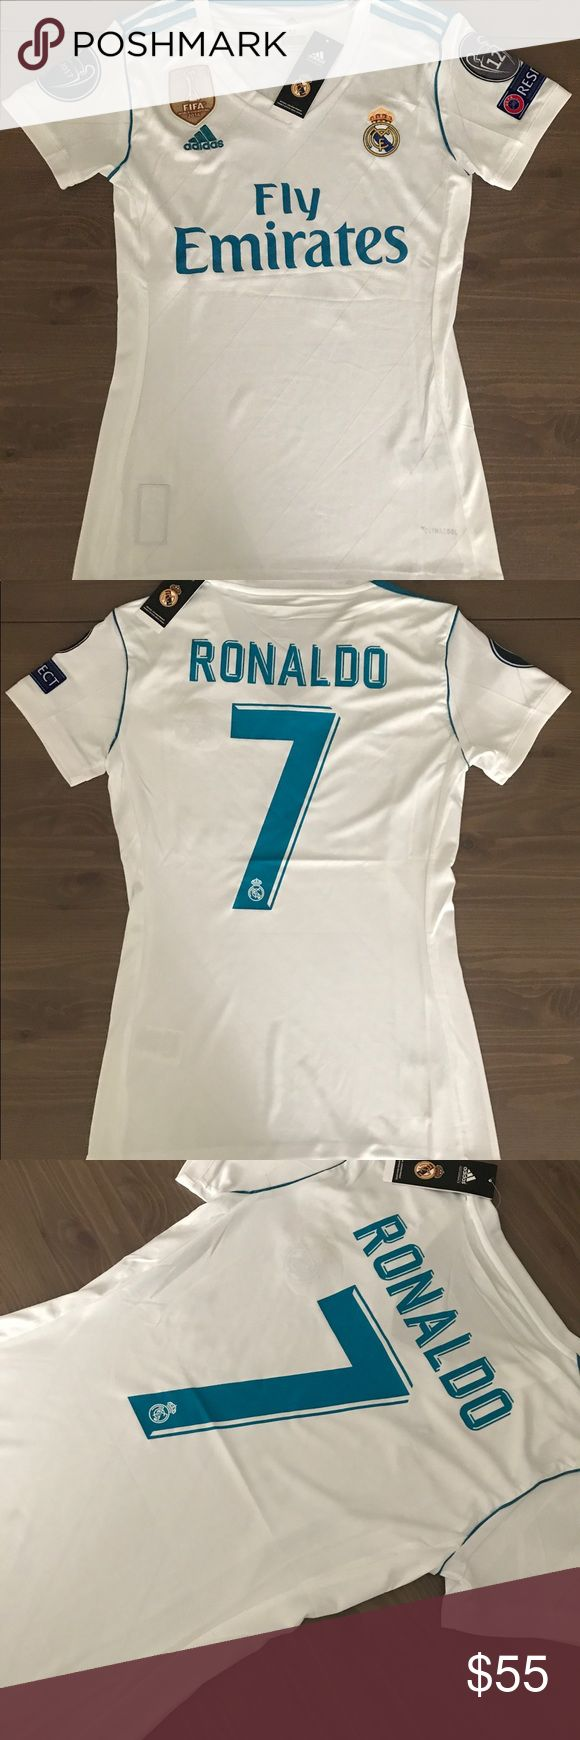 Women Real Madrid Ronaldo #7 soccer jersey adidas Women Real Madrid Ronaldo #7 soccer jersey adidas Champions league adidas Tops Tees - Short Sleeve